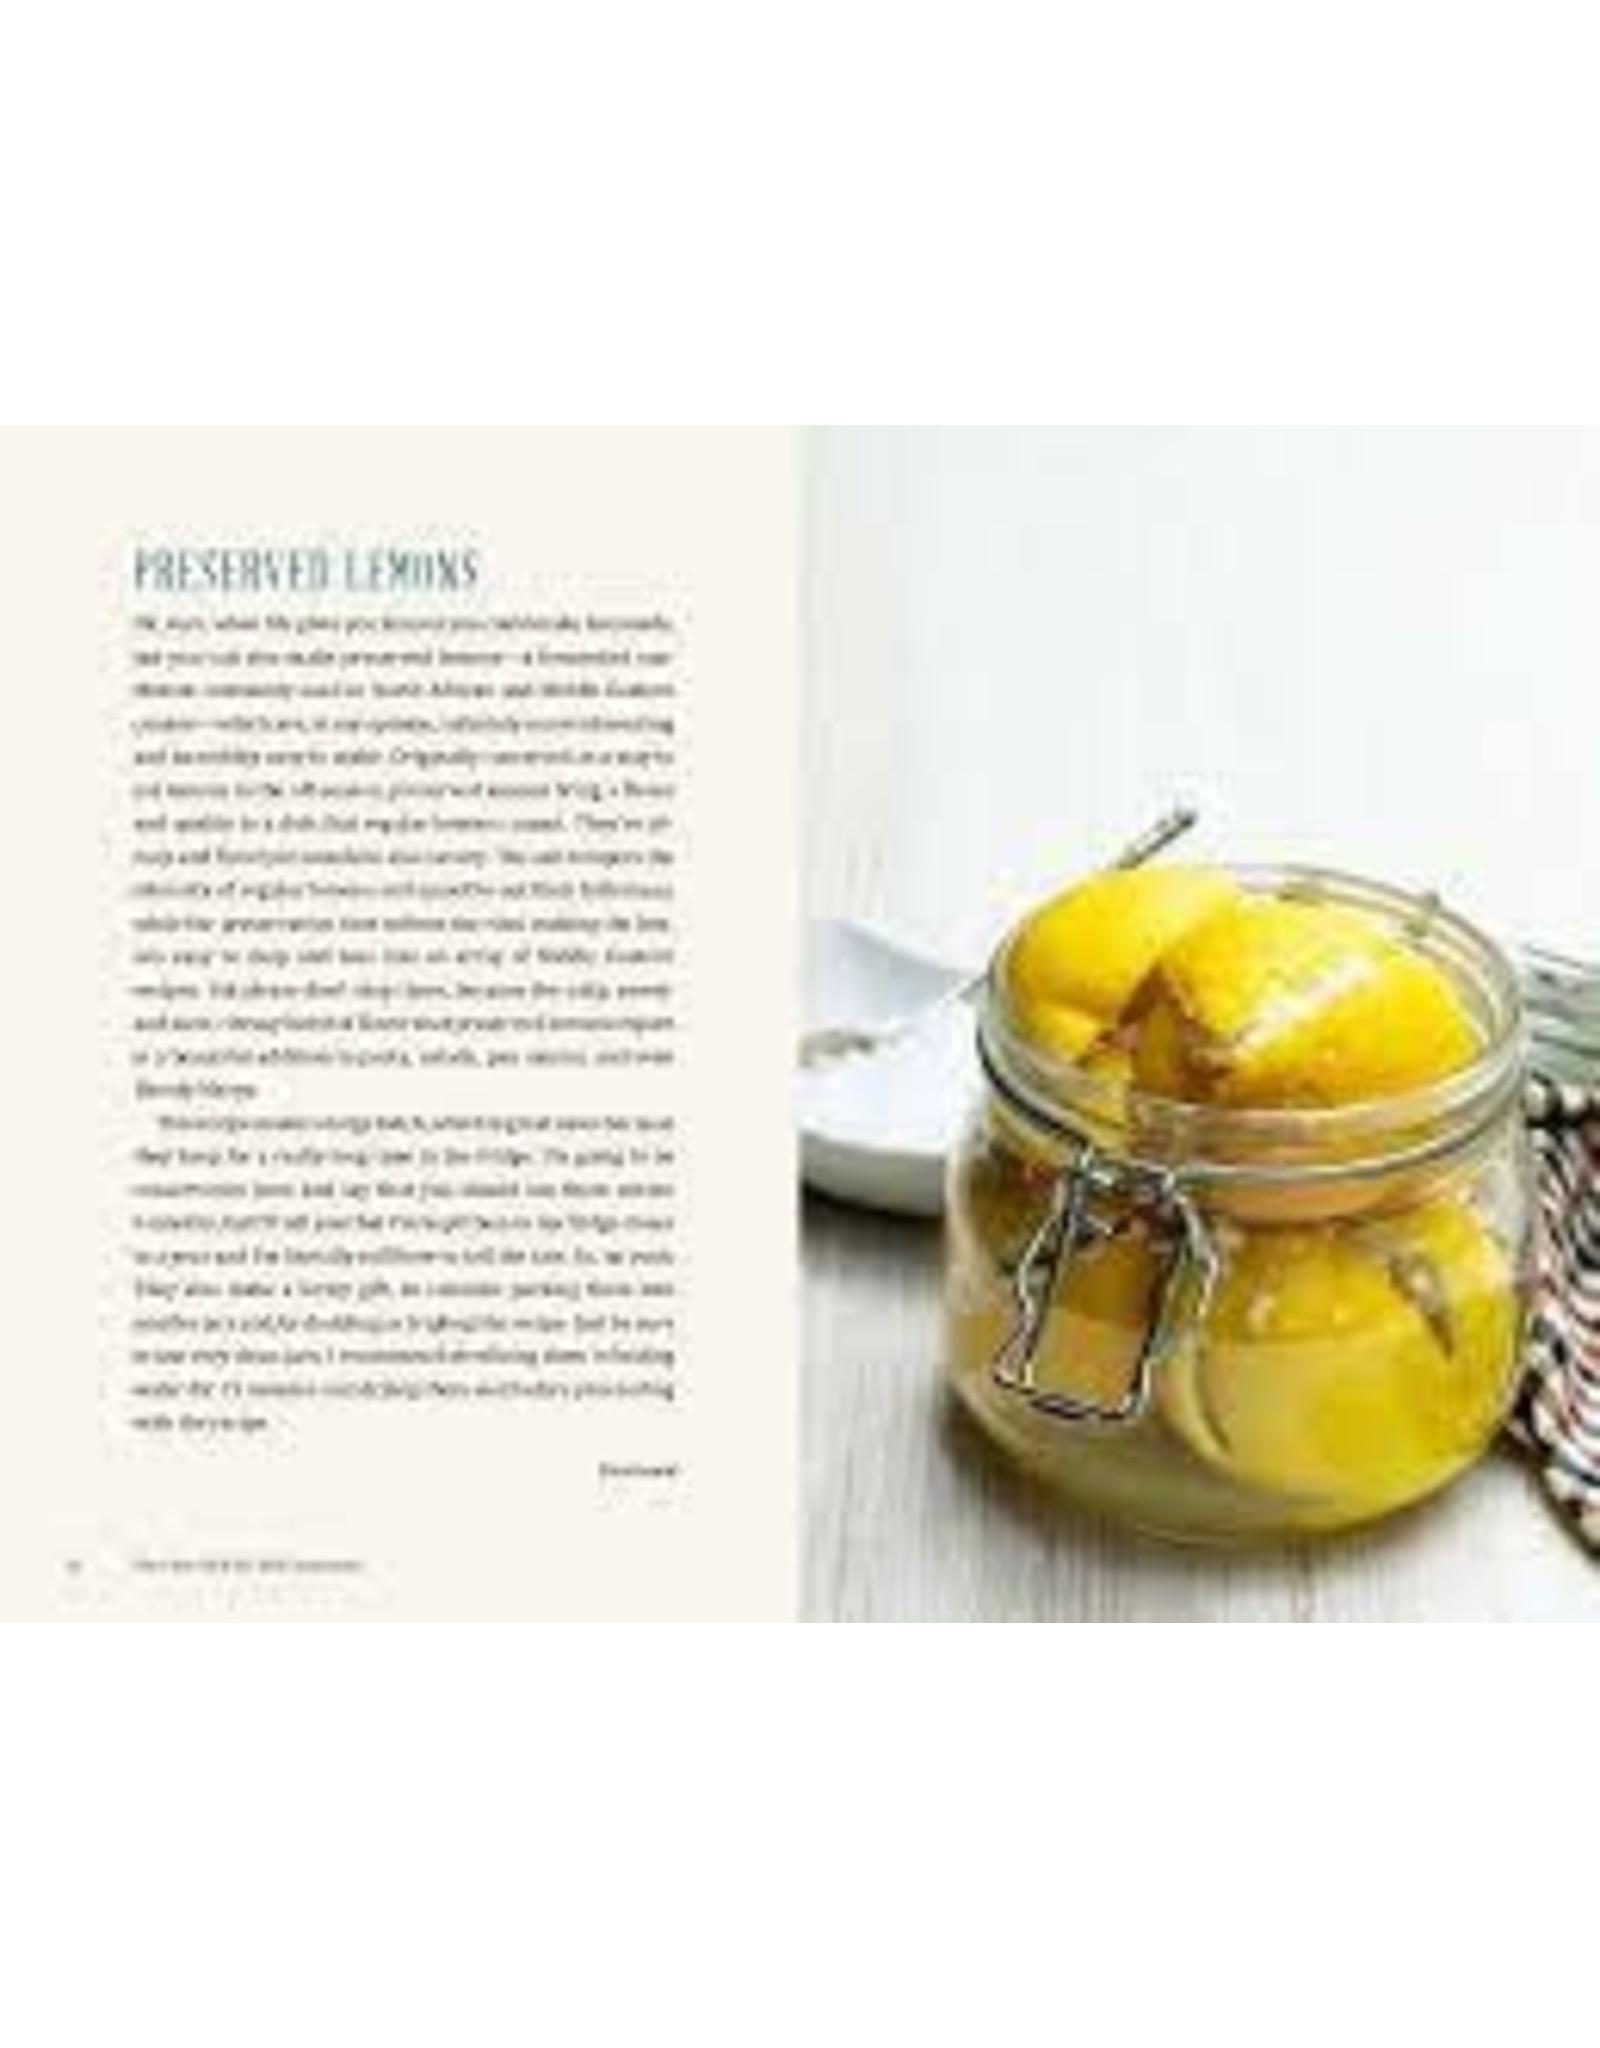 Books The Olive Oil & Sea Salt Companion by Suzy Scherr